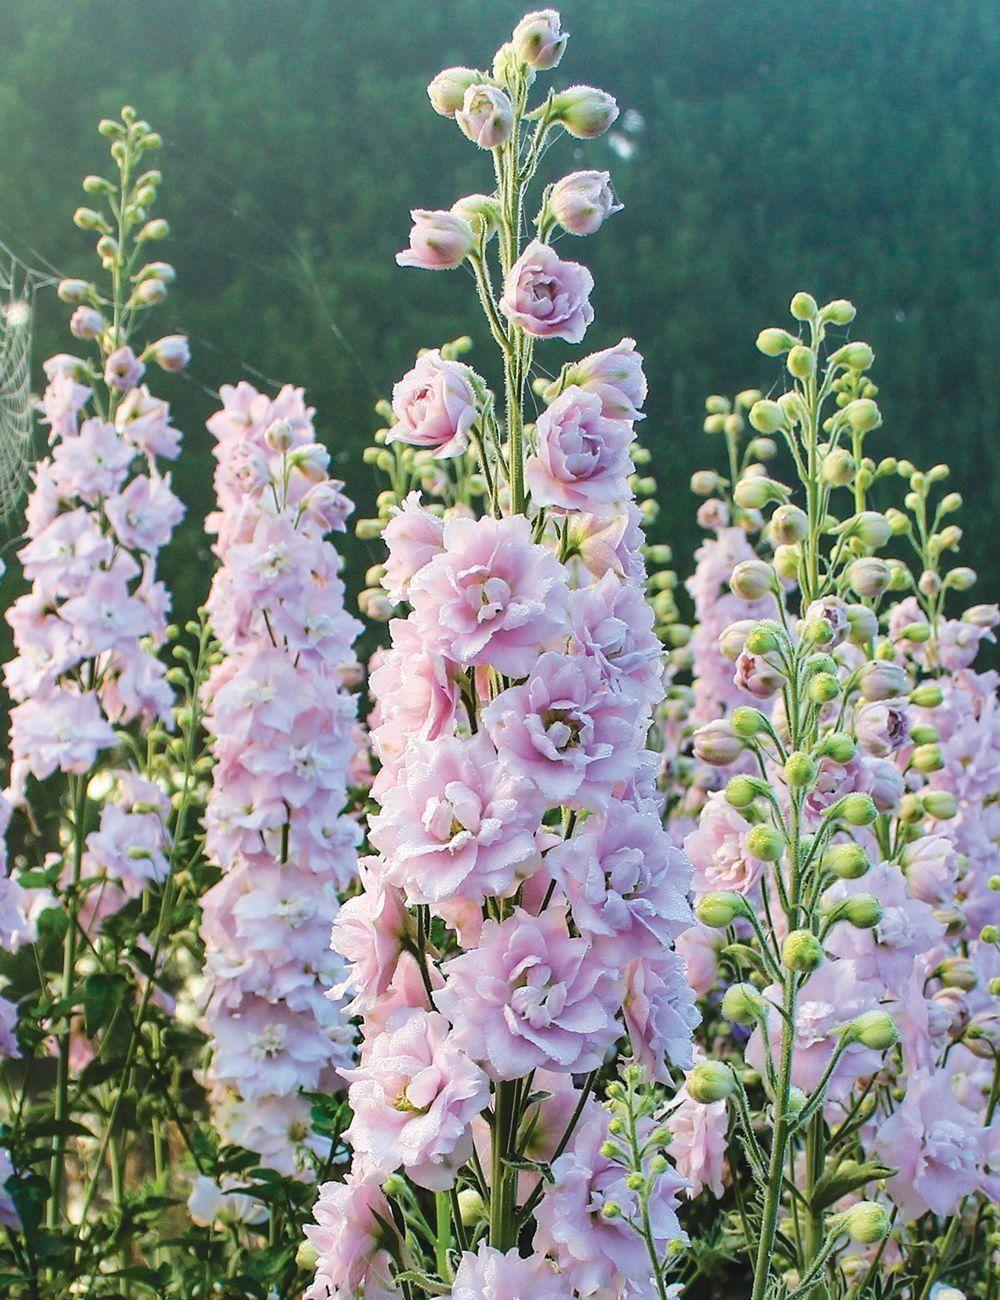 Dowdeswell Delphiniums Pink Blush Tesselaar Delphinium -  #delphiniums #dowdeswe    #cat2 #gardensucculent #diyeasygardenideas #gardenlandscapedesign #diygardendesign #diygardenflower #gardentipsforbeginners #gardenlandscaping #pink #dowdeswell #delphiniums #blush #tesselaar #delphinium #dowdeswe - lyricsfriday